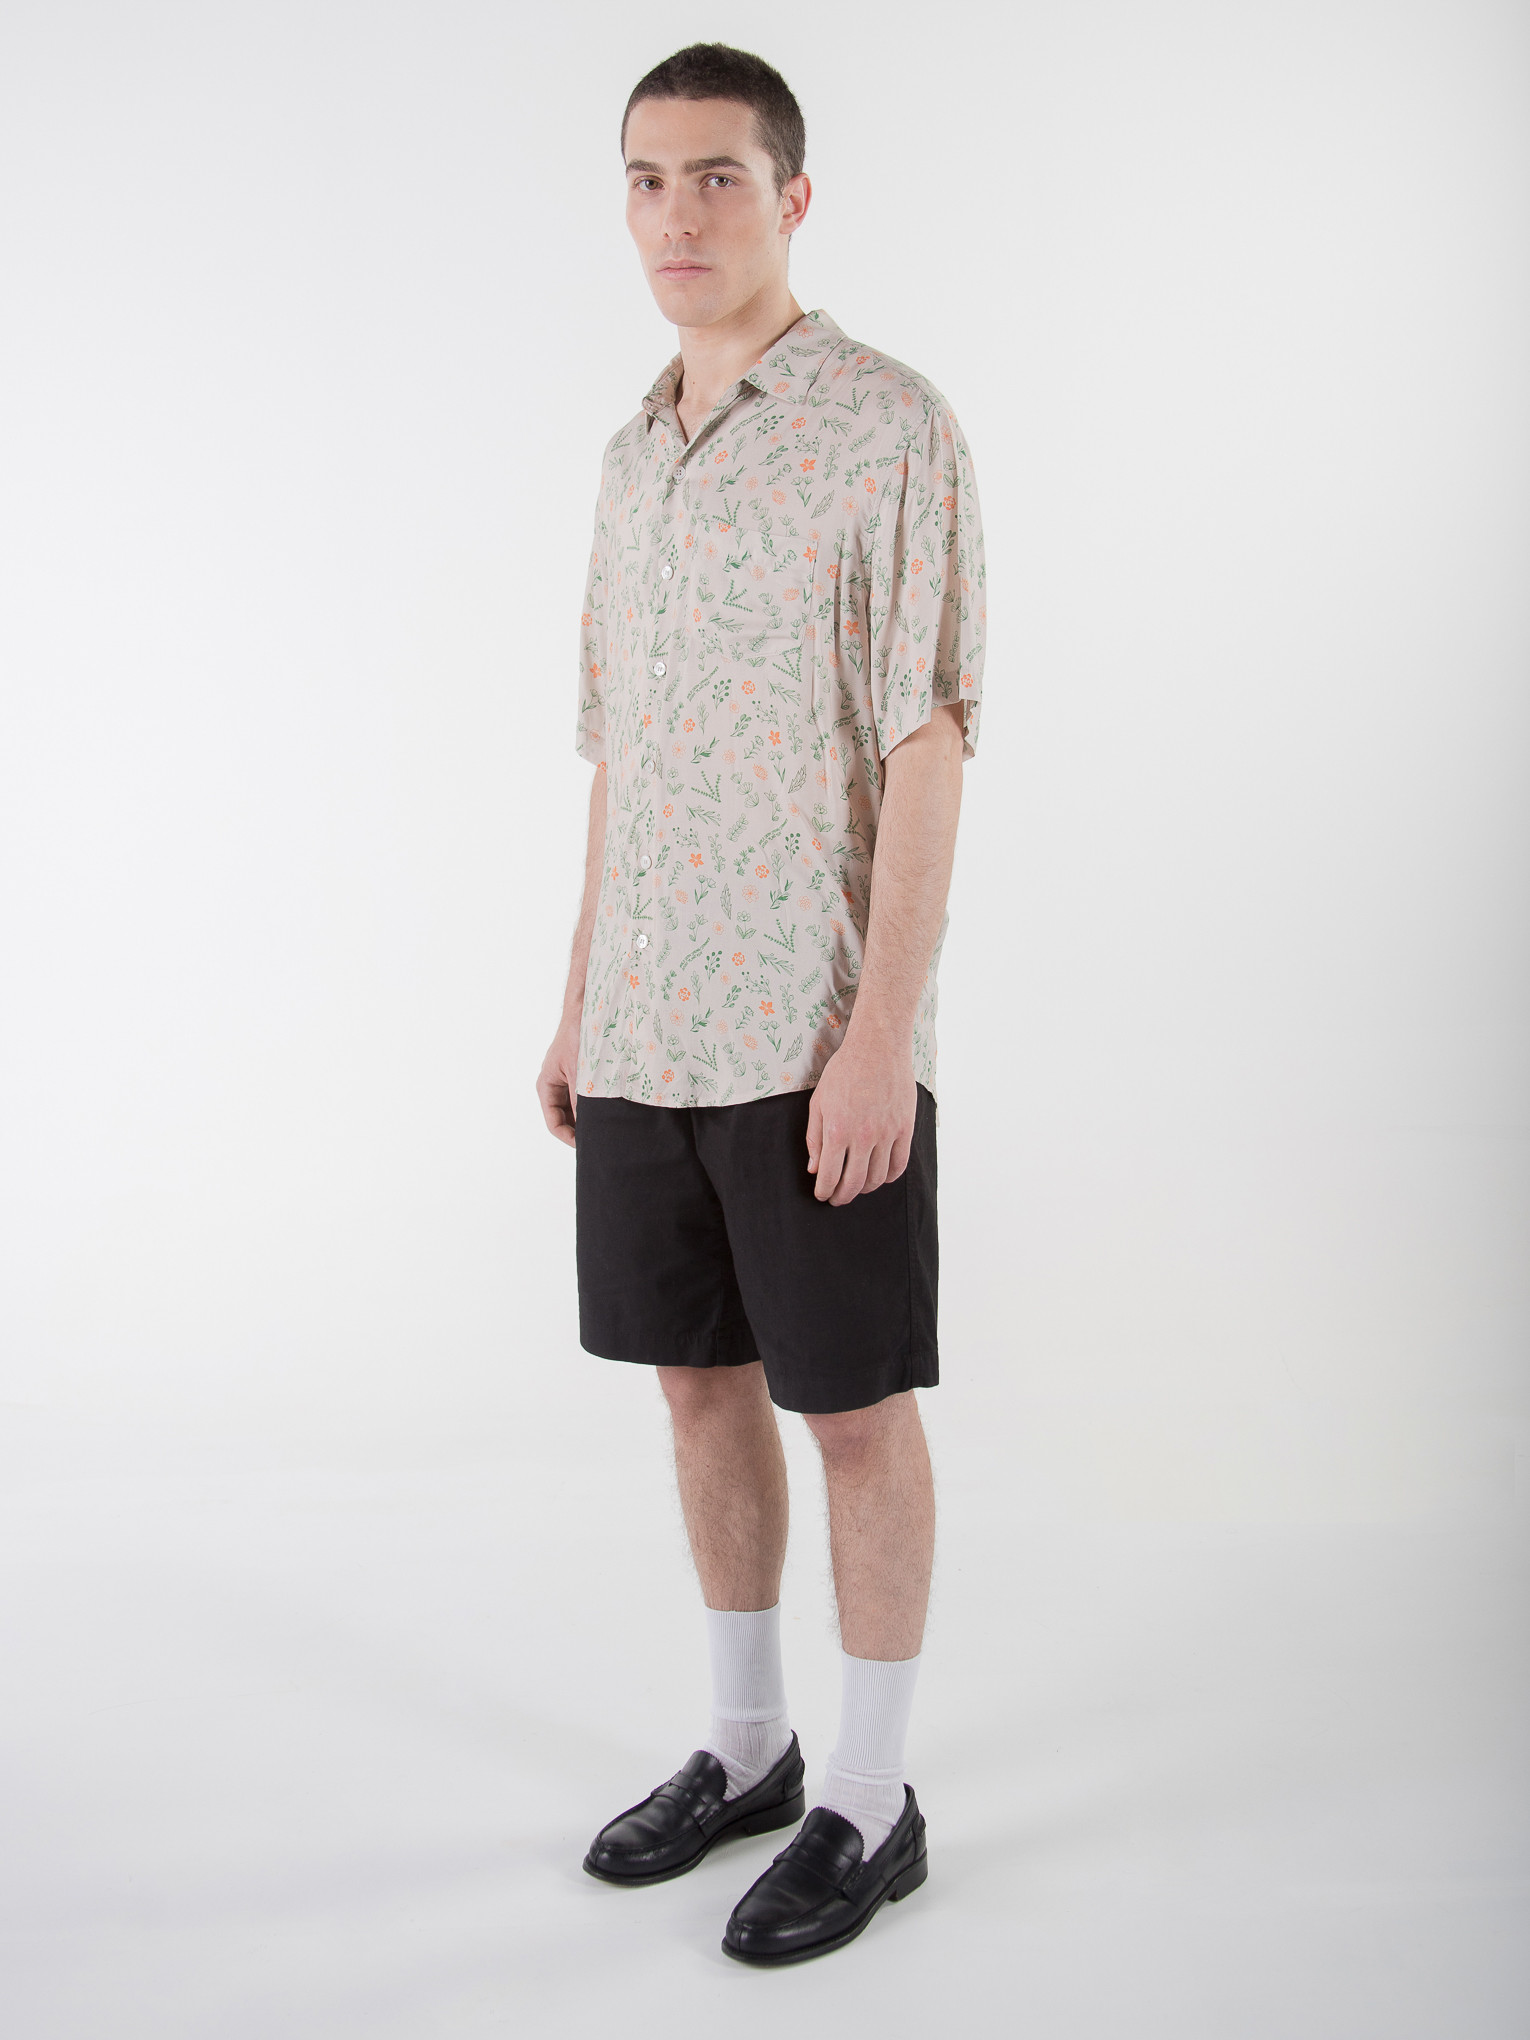 09_rold_skov_ss20_plantasia_shirt-04.jpg